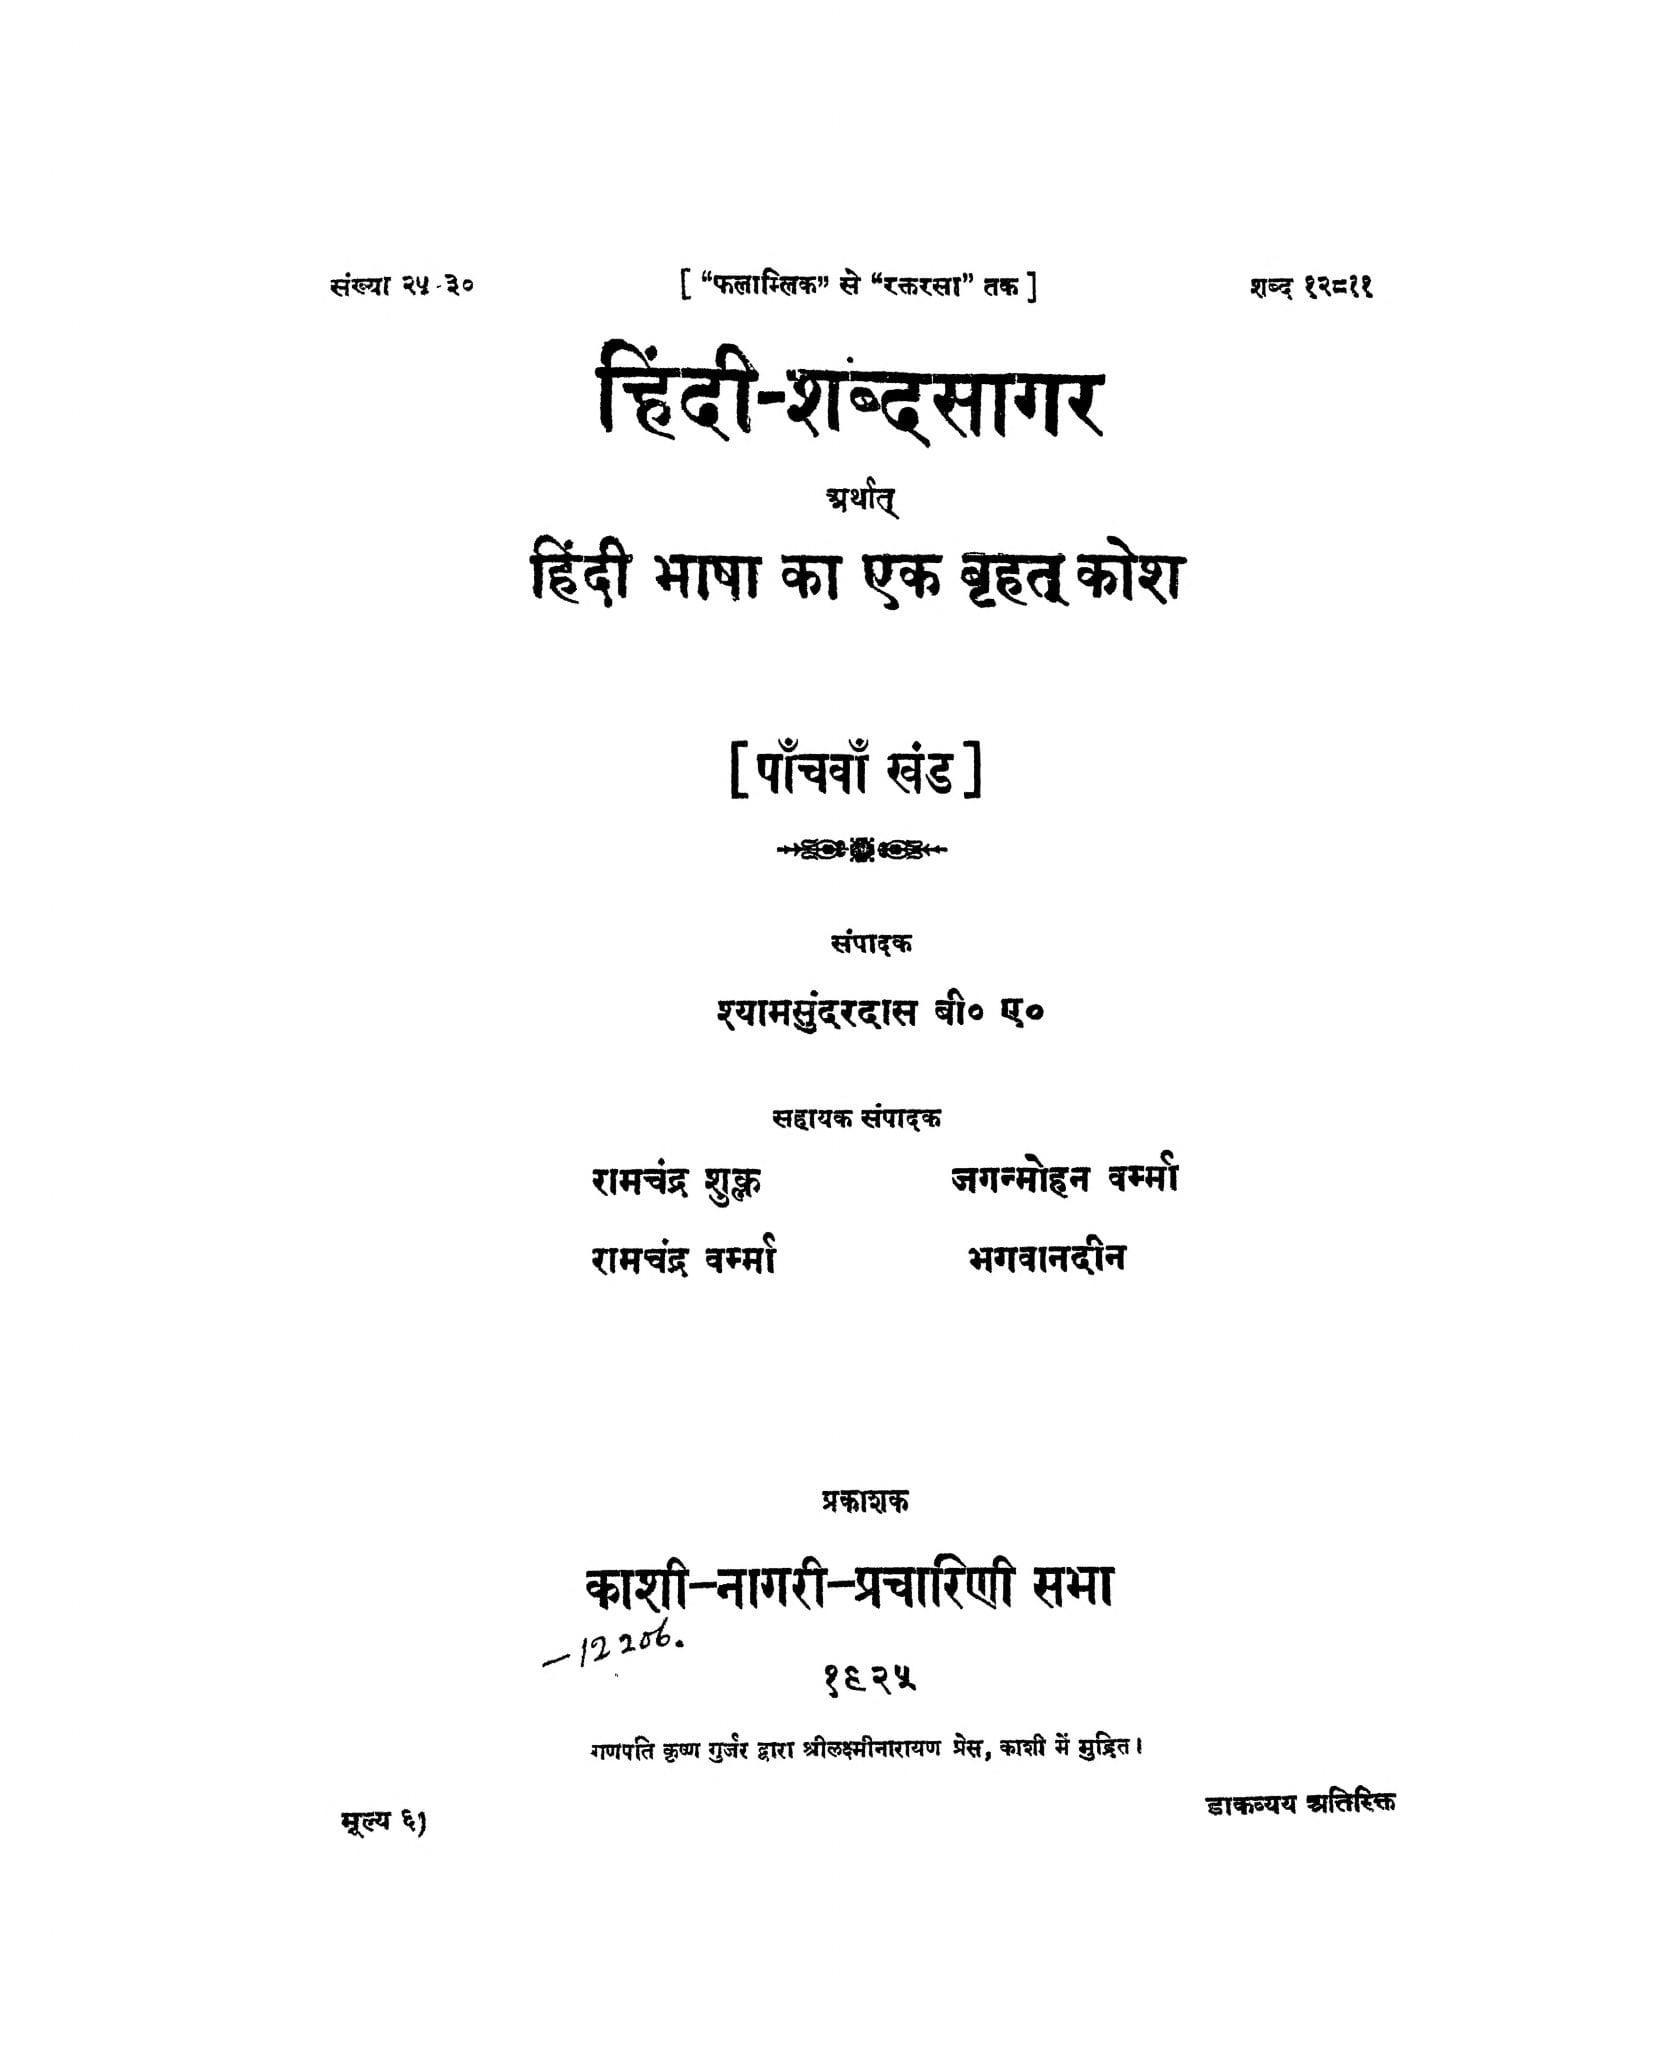 Book Image : हिंदी शब्द सागर खंड 5 - Hindi Shabd Sagar Pachawa Khand